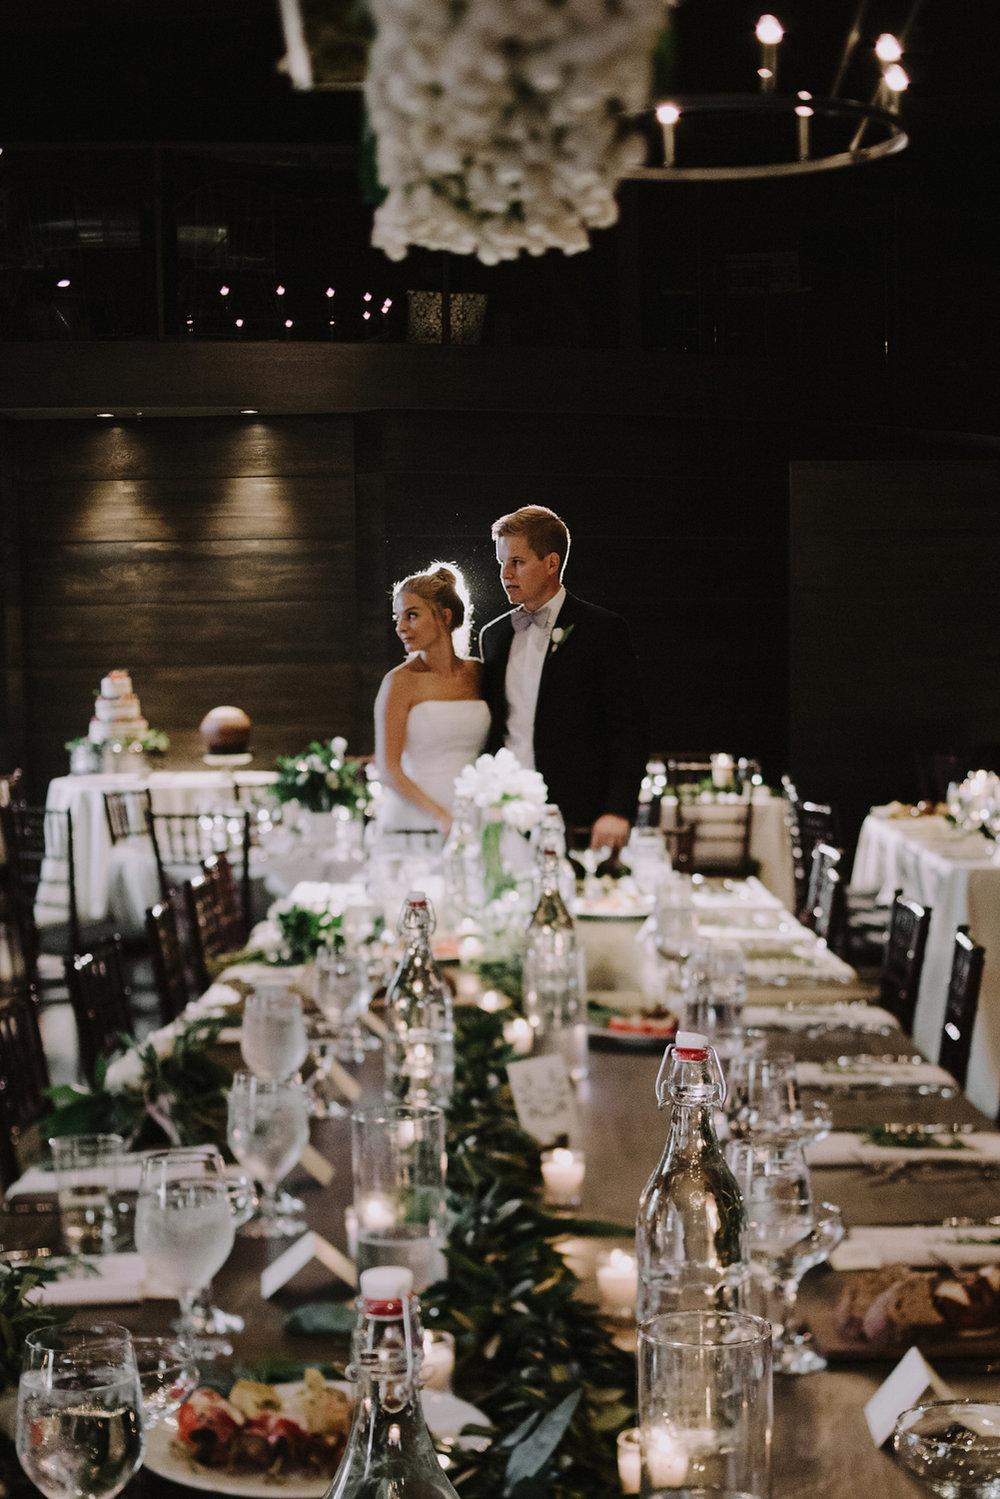 BrideGroom_TableSetting.jpg